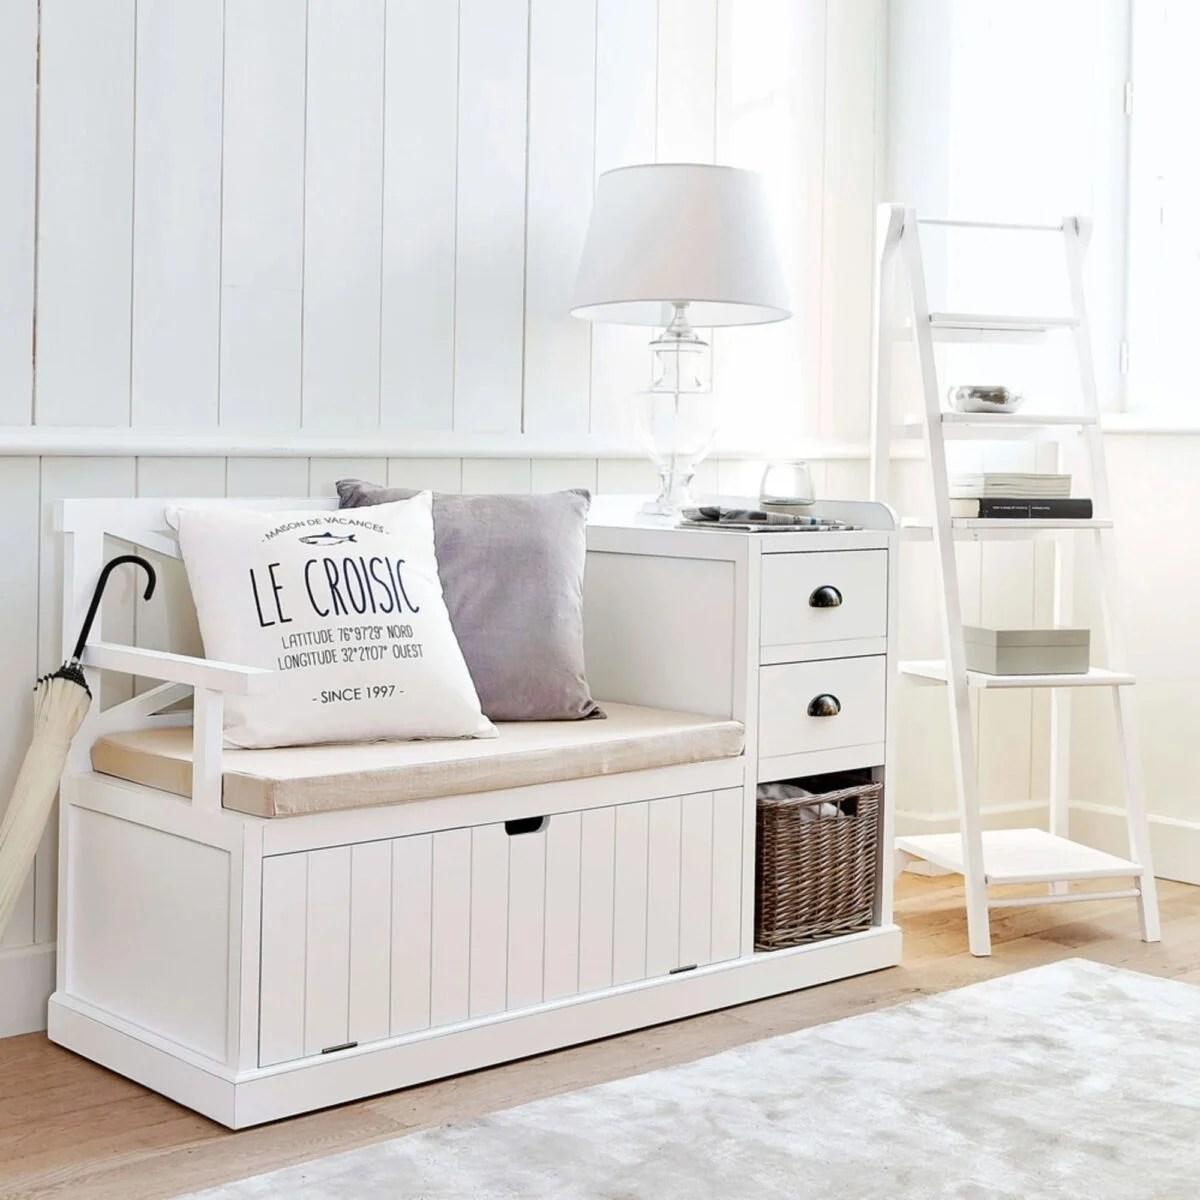 La catena francese di mobili. Mobili Per Ingresso Maisons Du Monde